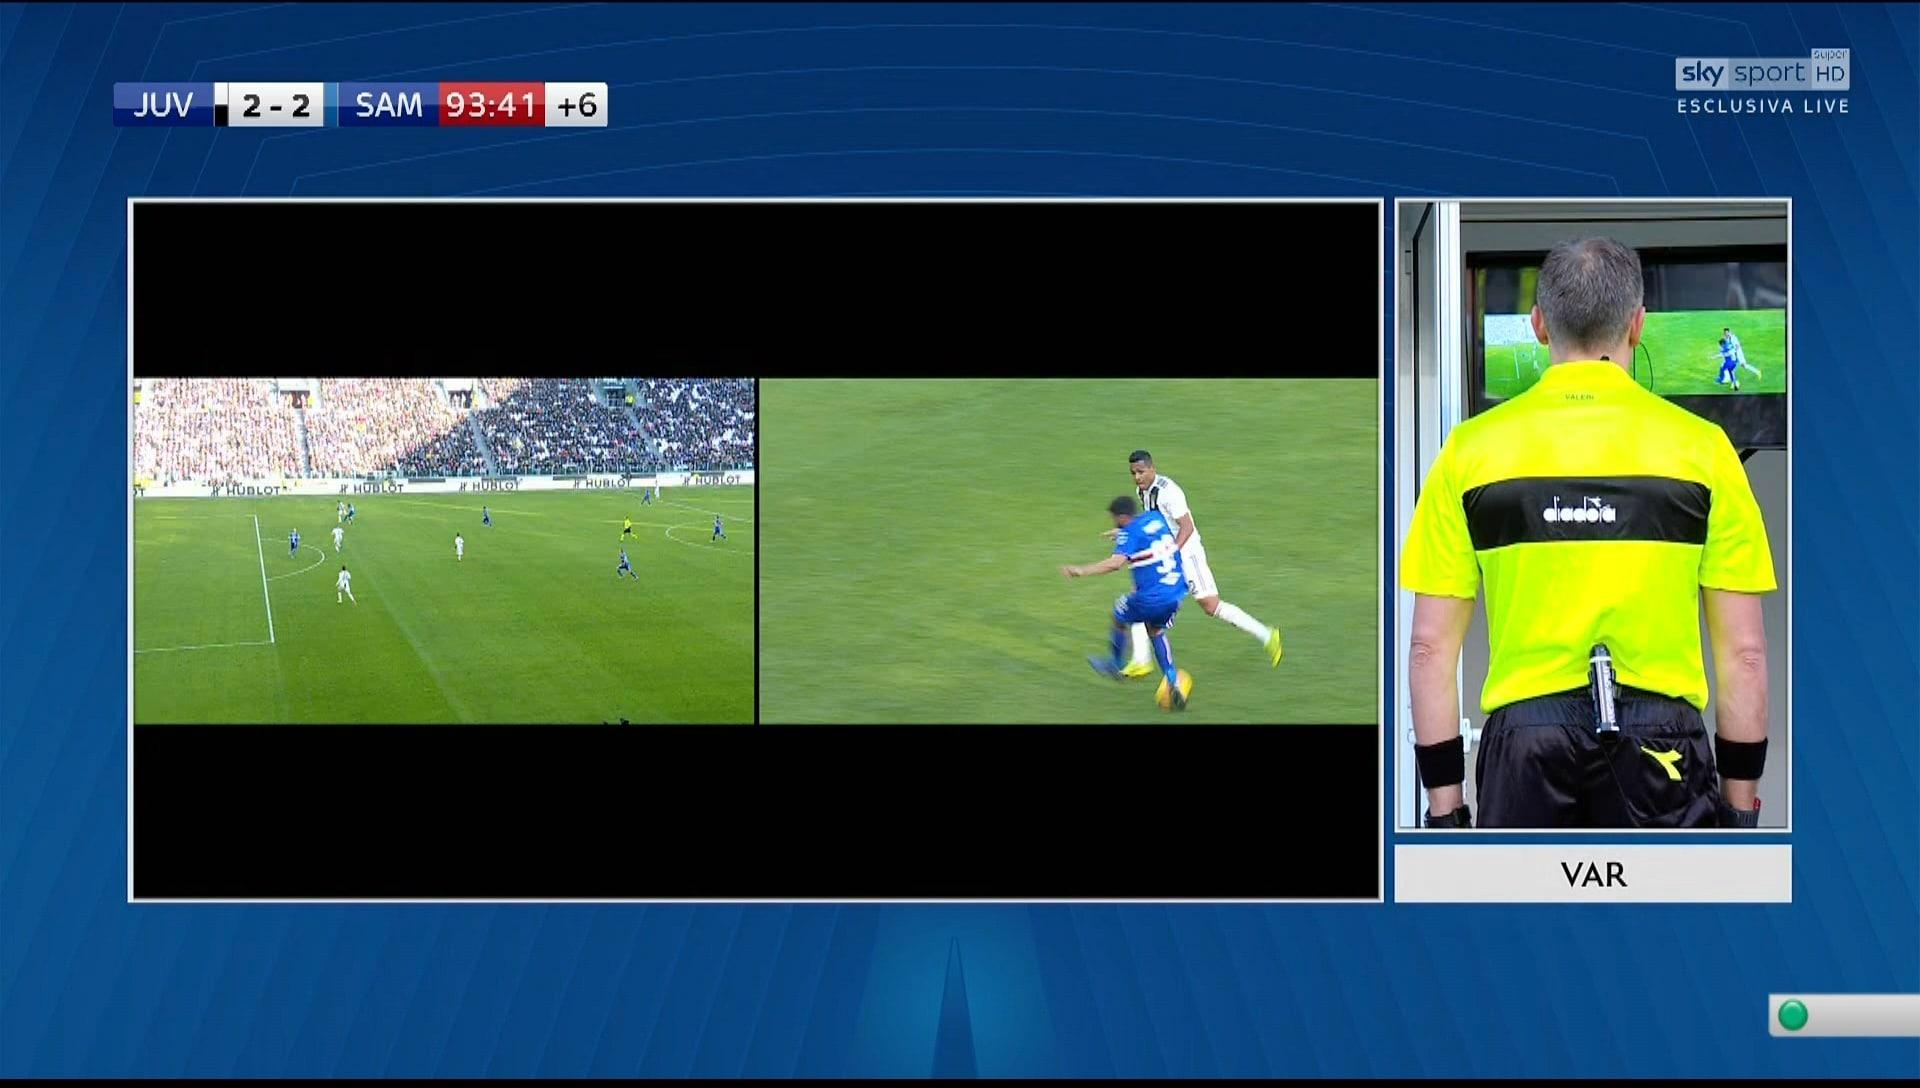 Juventus-Sampdoria, il Var cancella il gol al 92' di Saponara